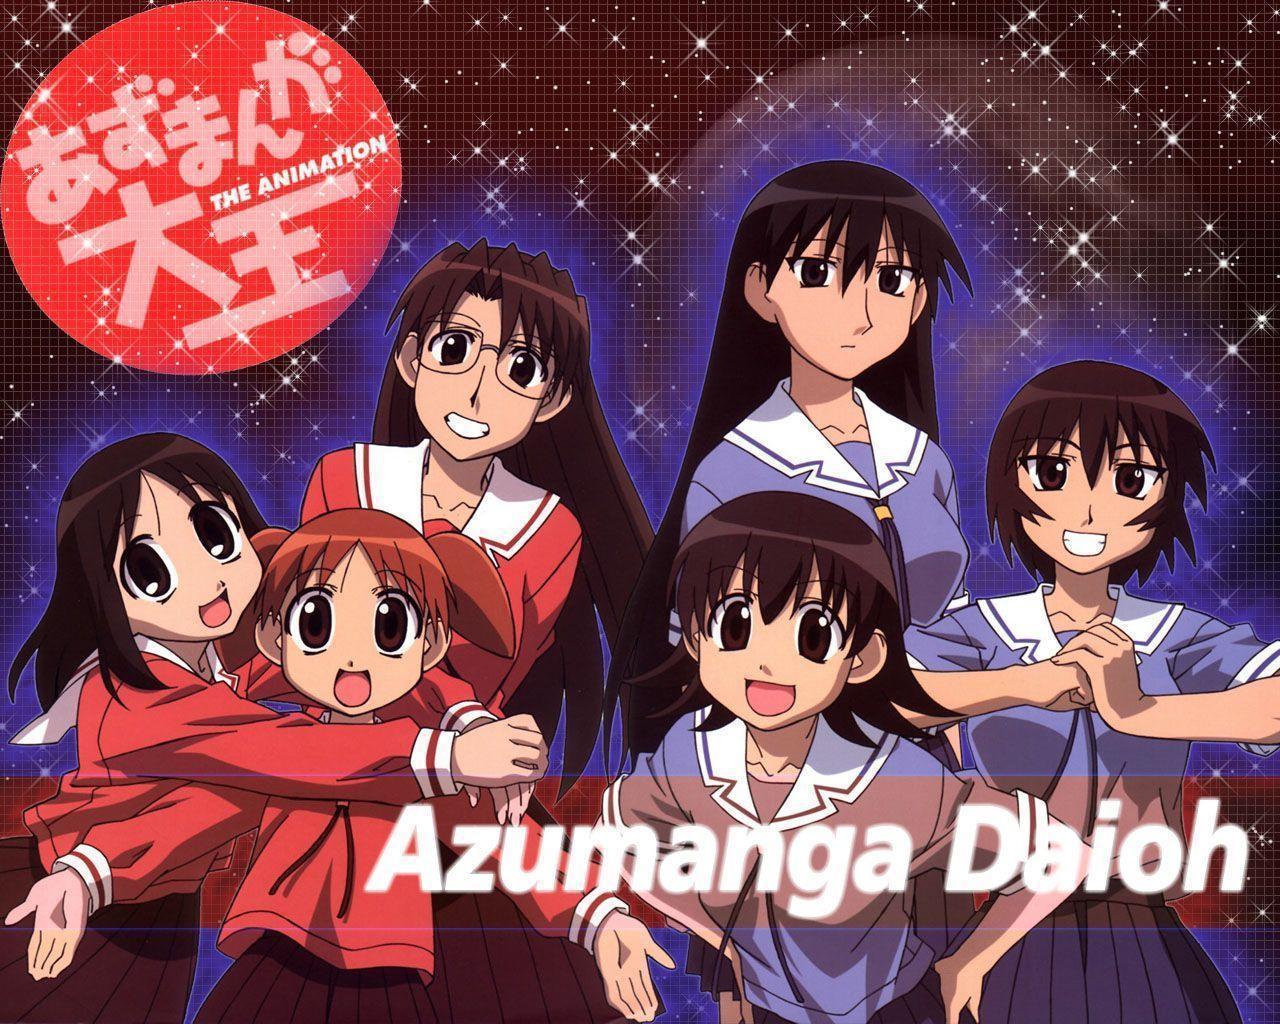 Azumanga daioh fighter download